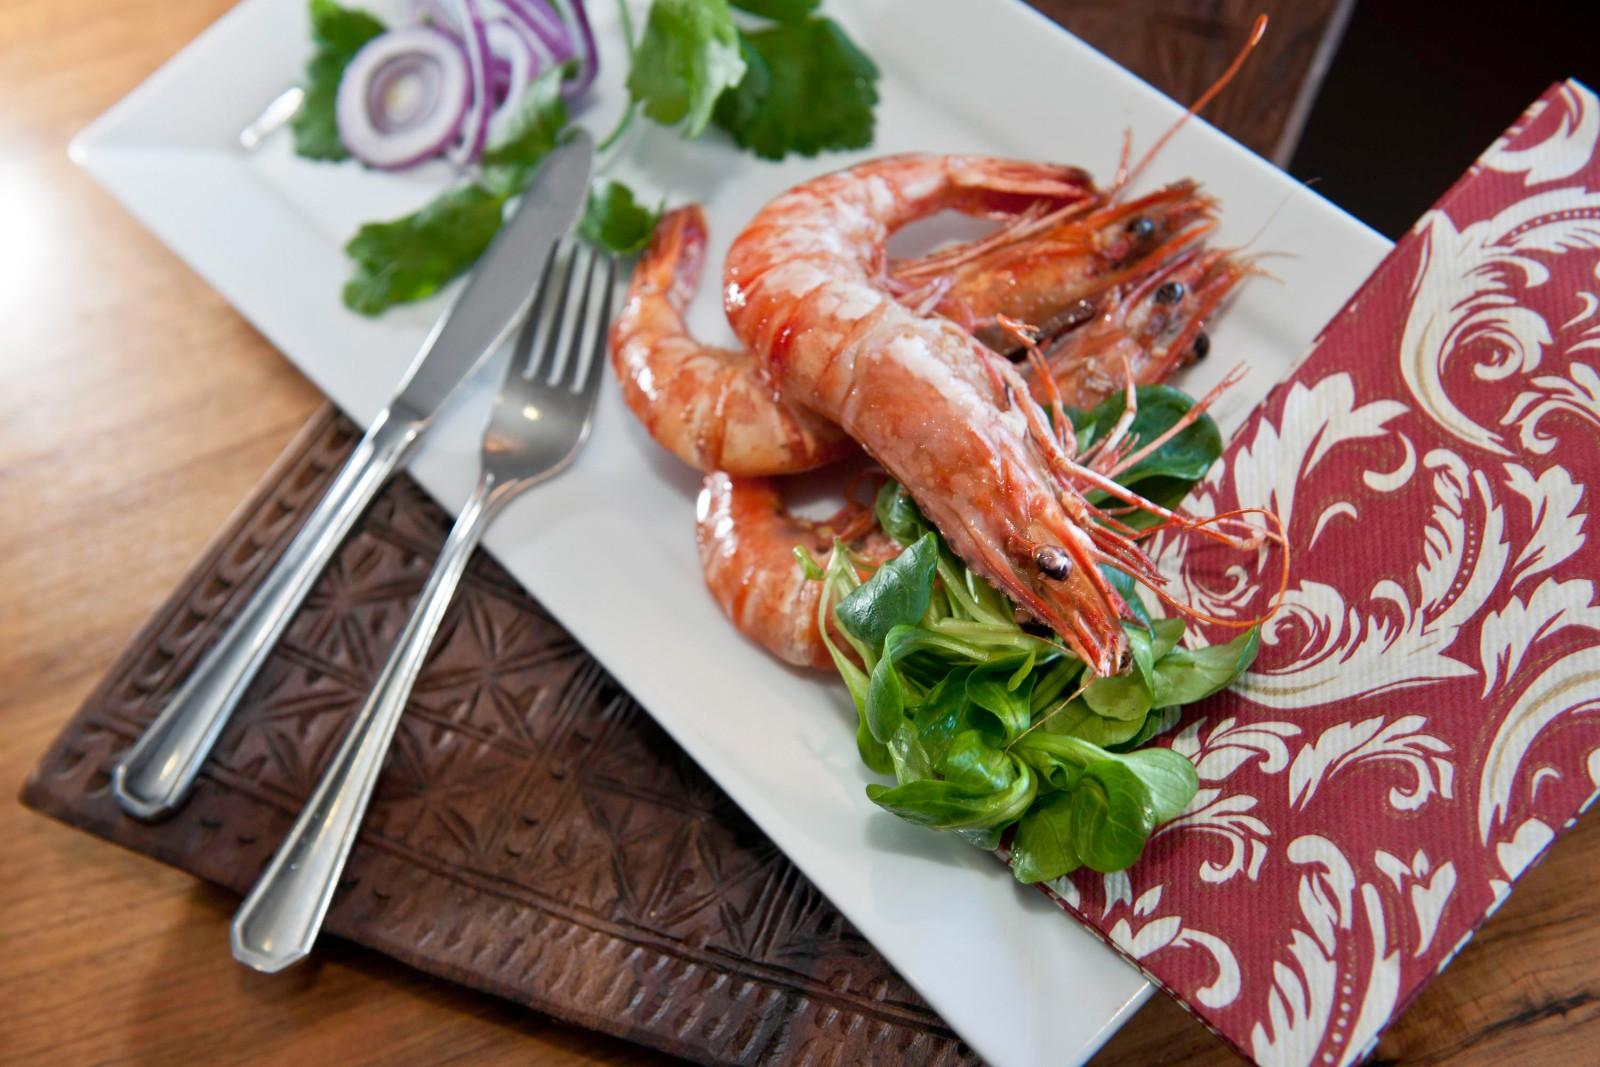 Food Fotografie im Restaurant Topolino